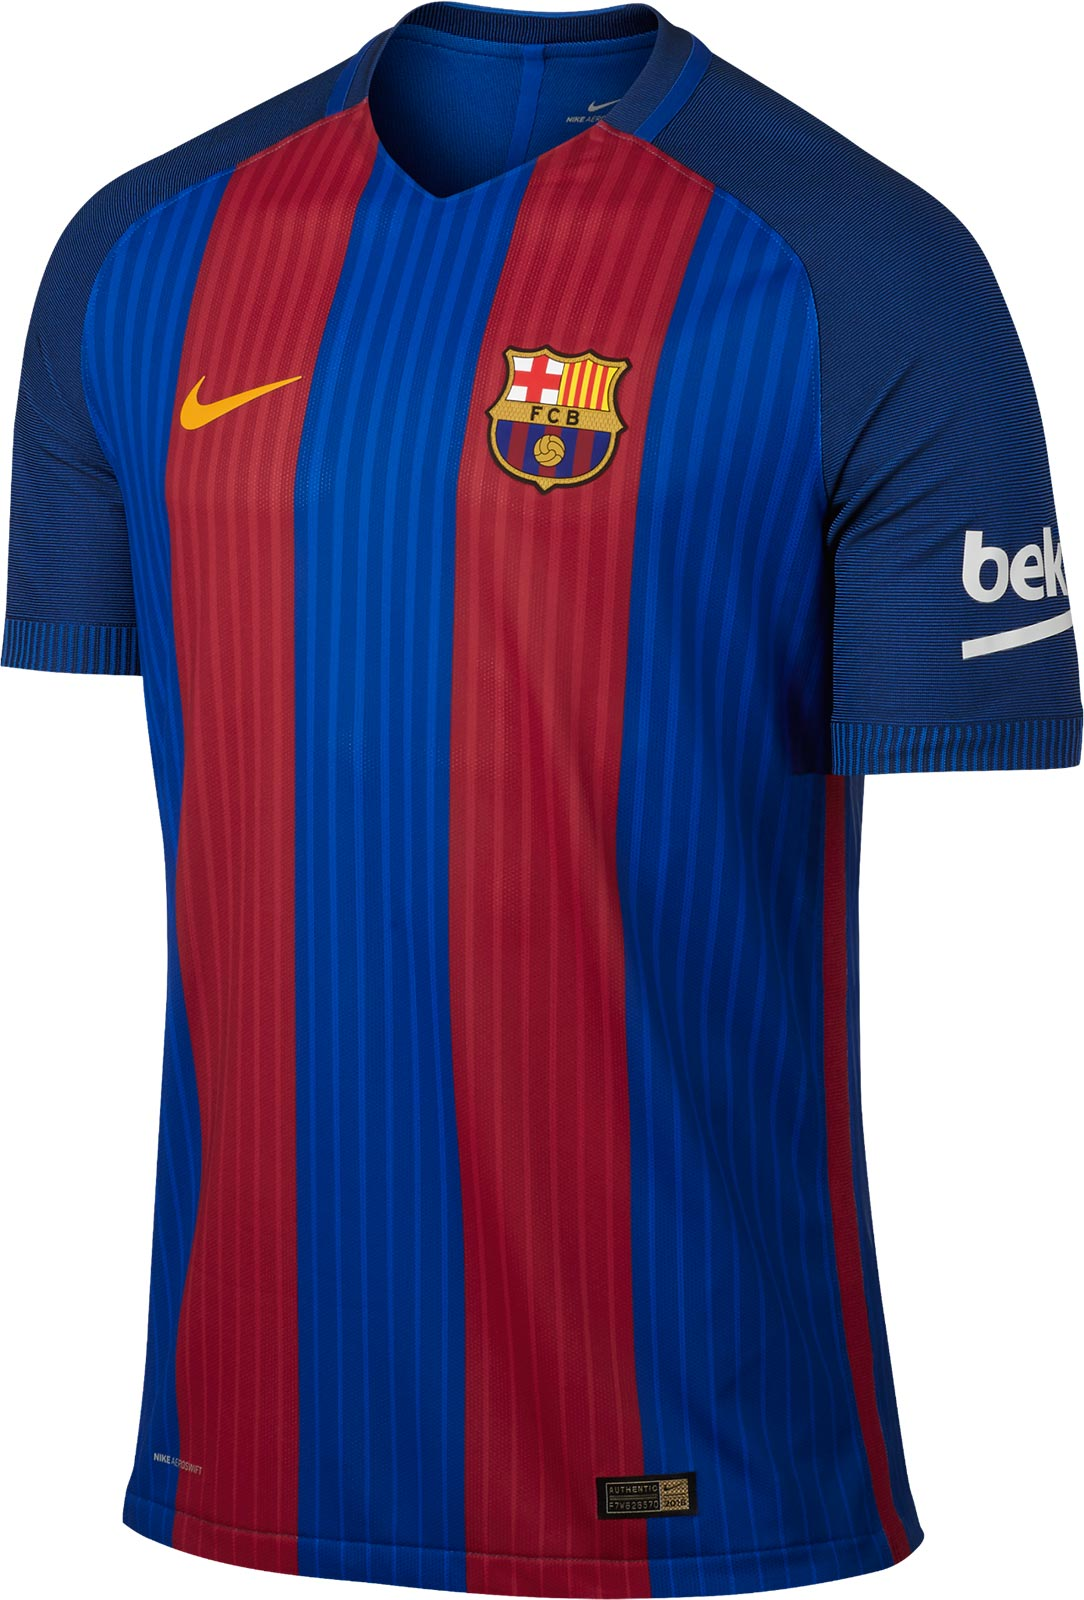 b0bc58001ff kit dls barcelona 2017 fts 15 dls 16 fc barcelona kits 2016 2017